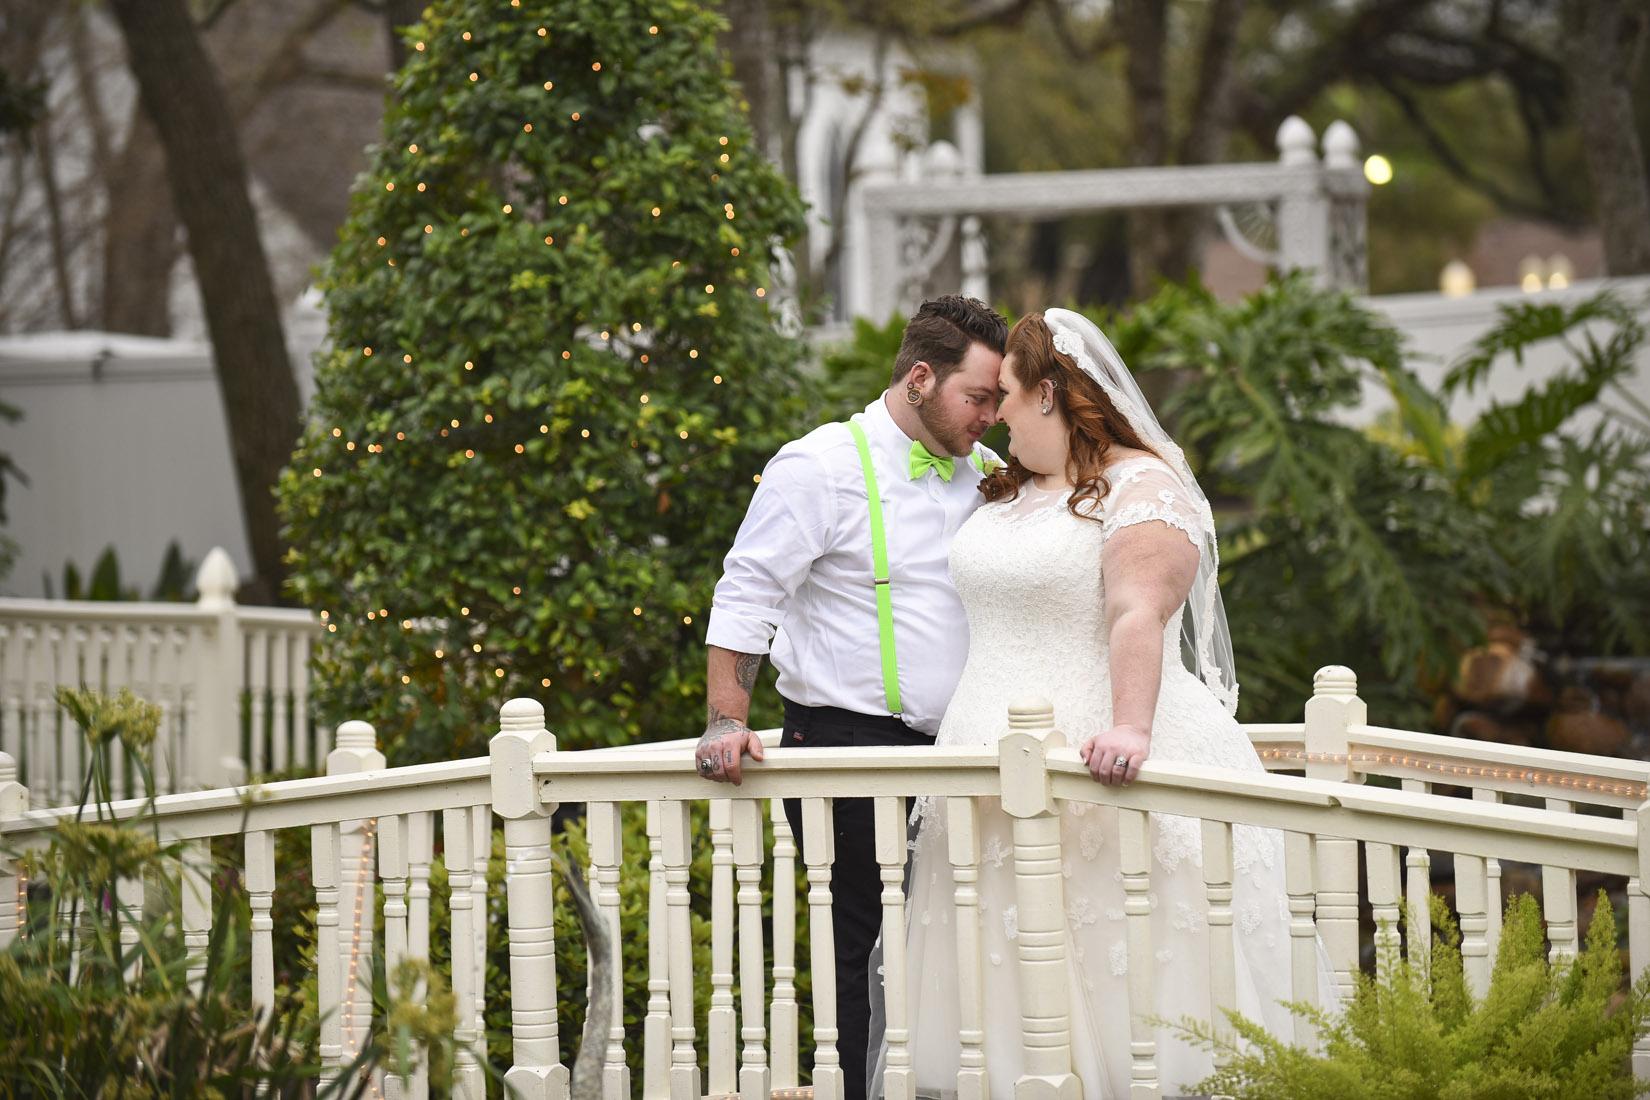 butlers-courtyard-wedding-venue-intimate-houston-photos